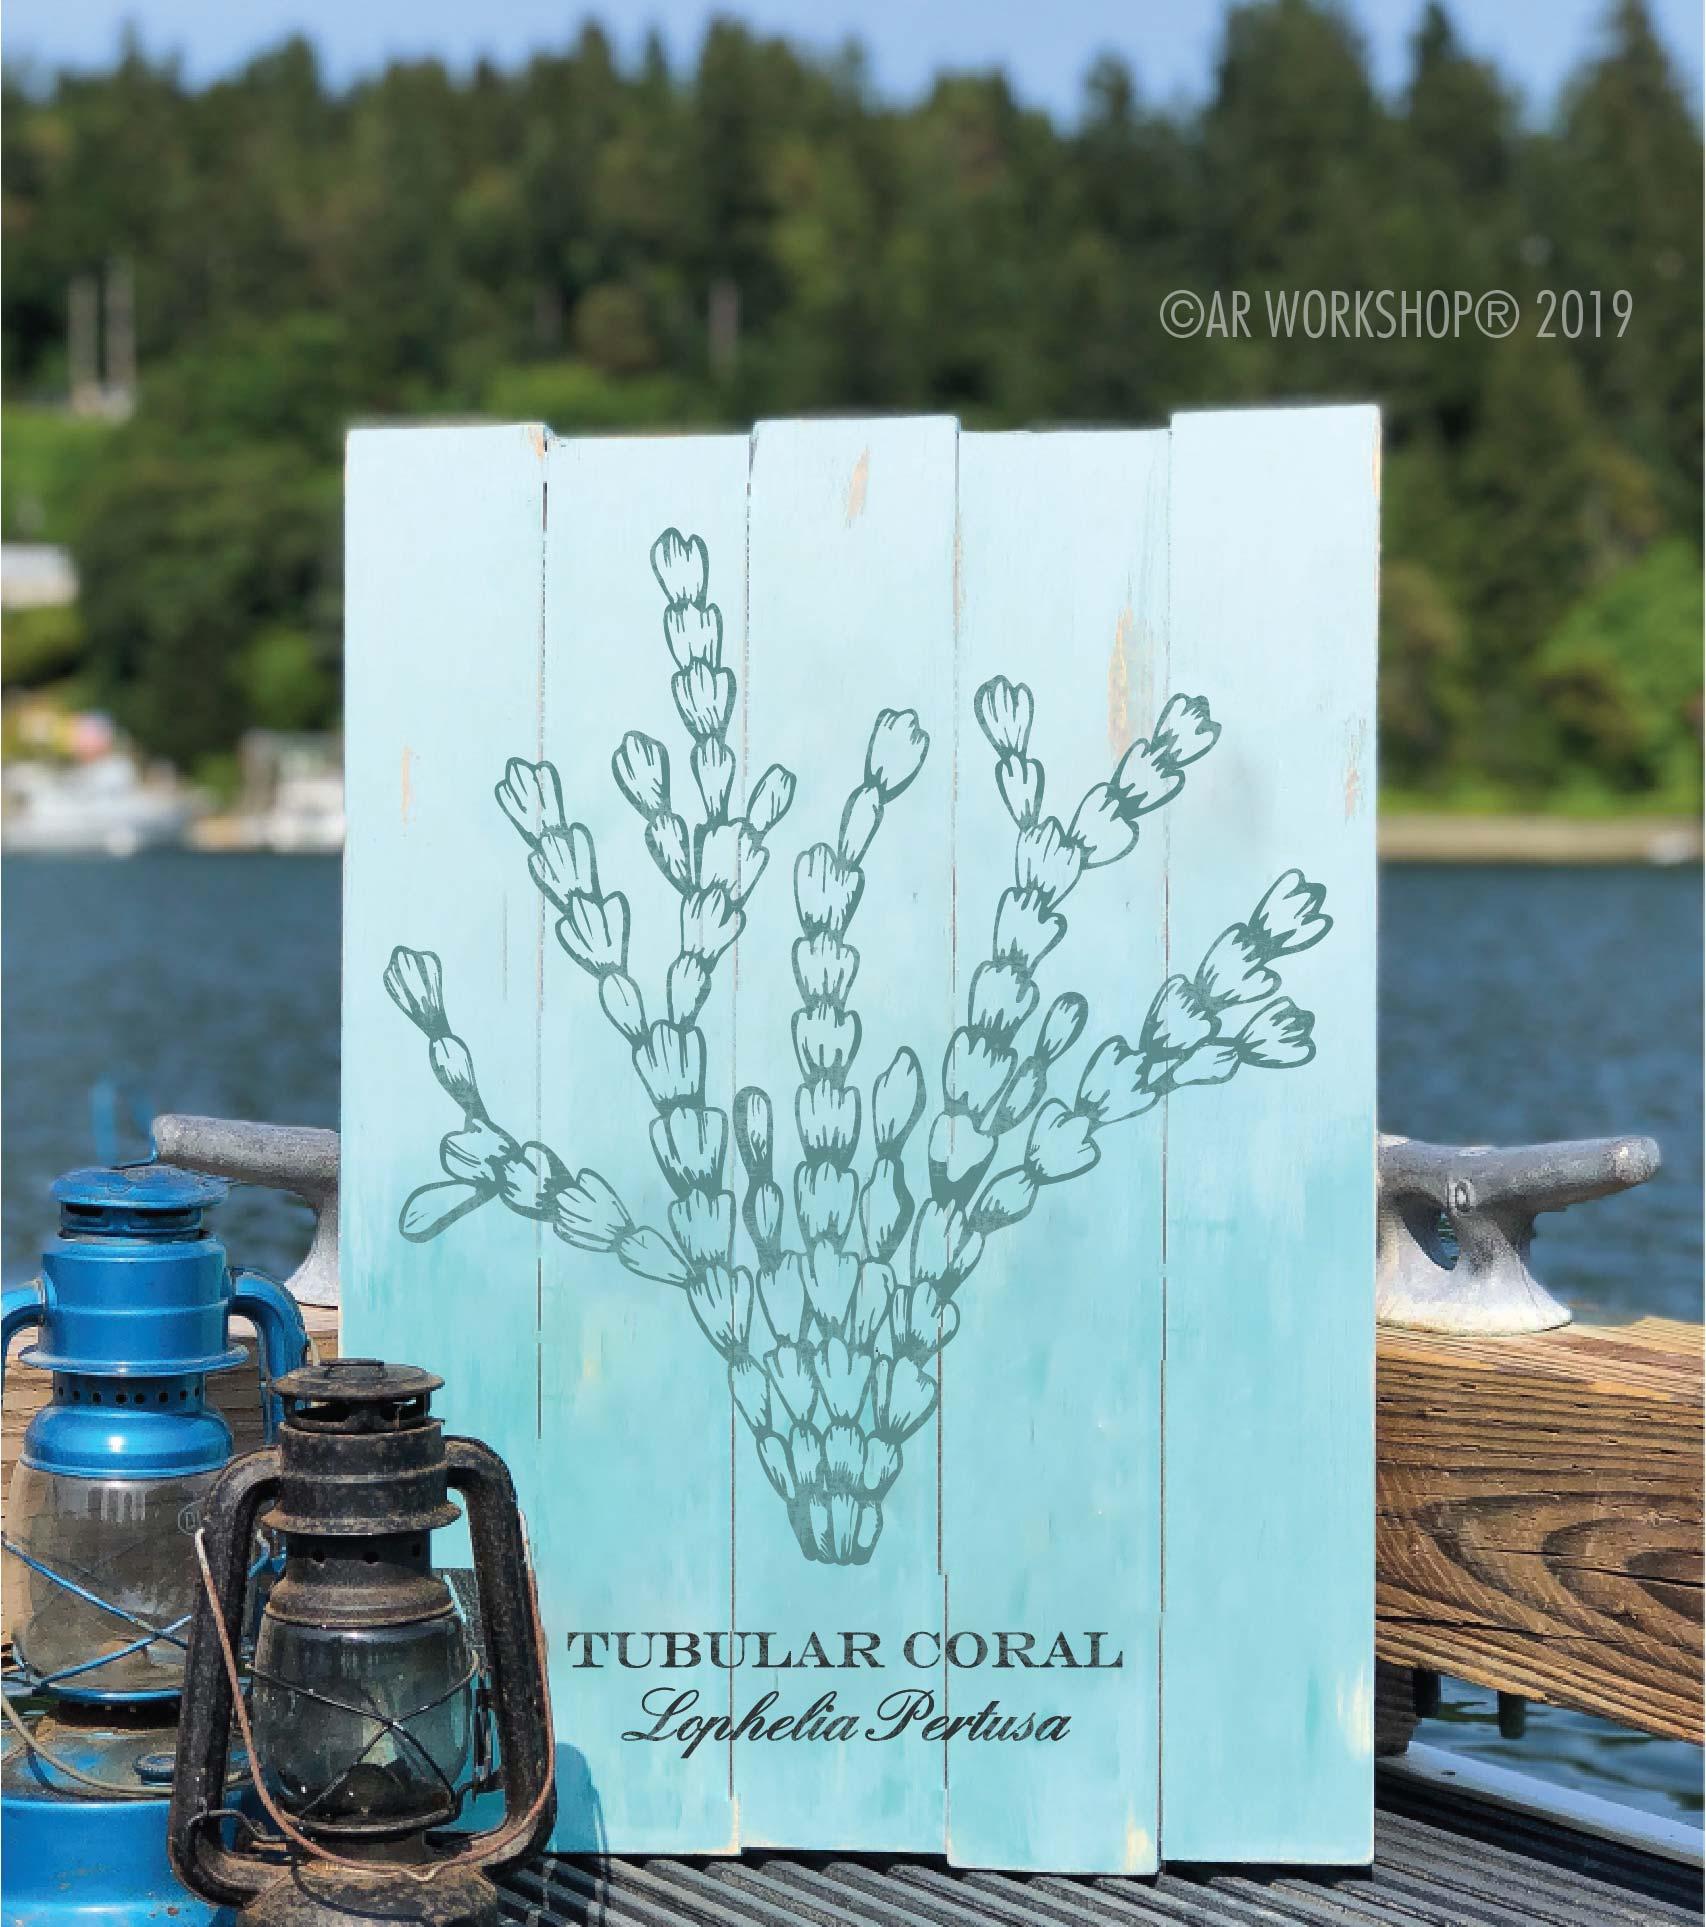 tubular coral plank sign 17.5x24